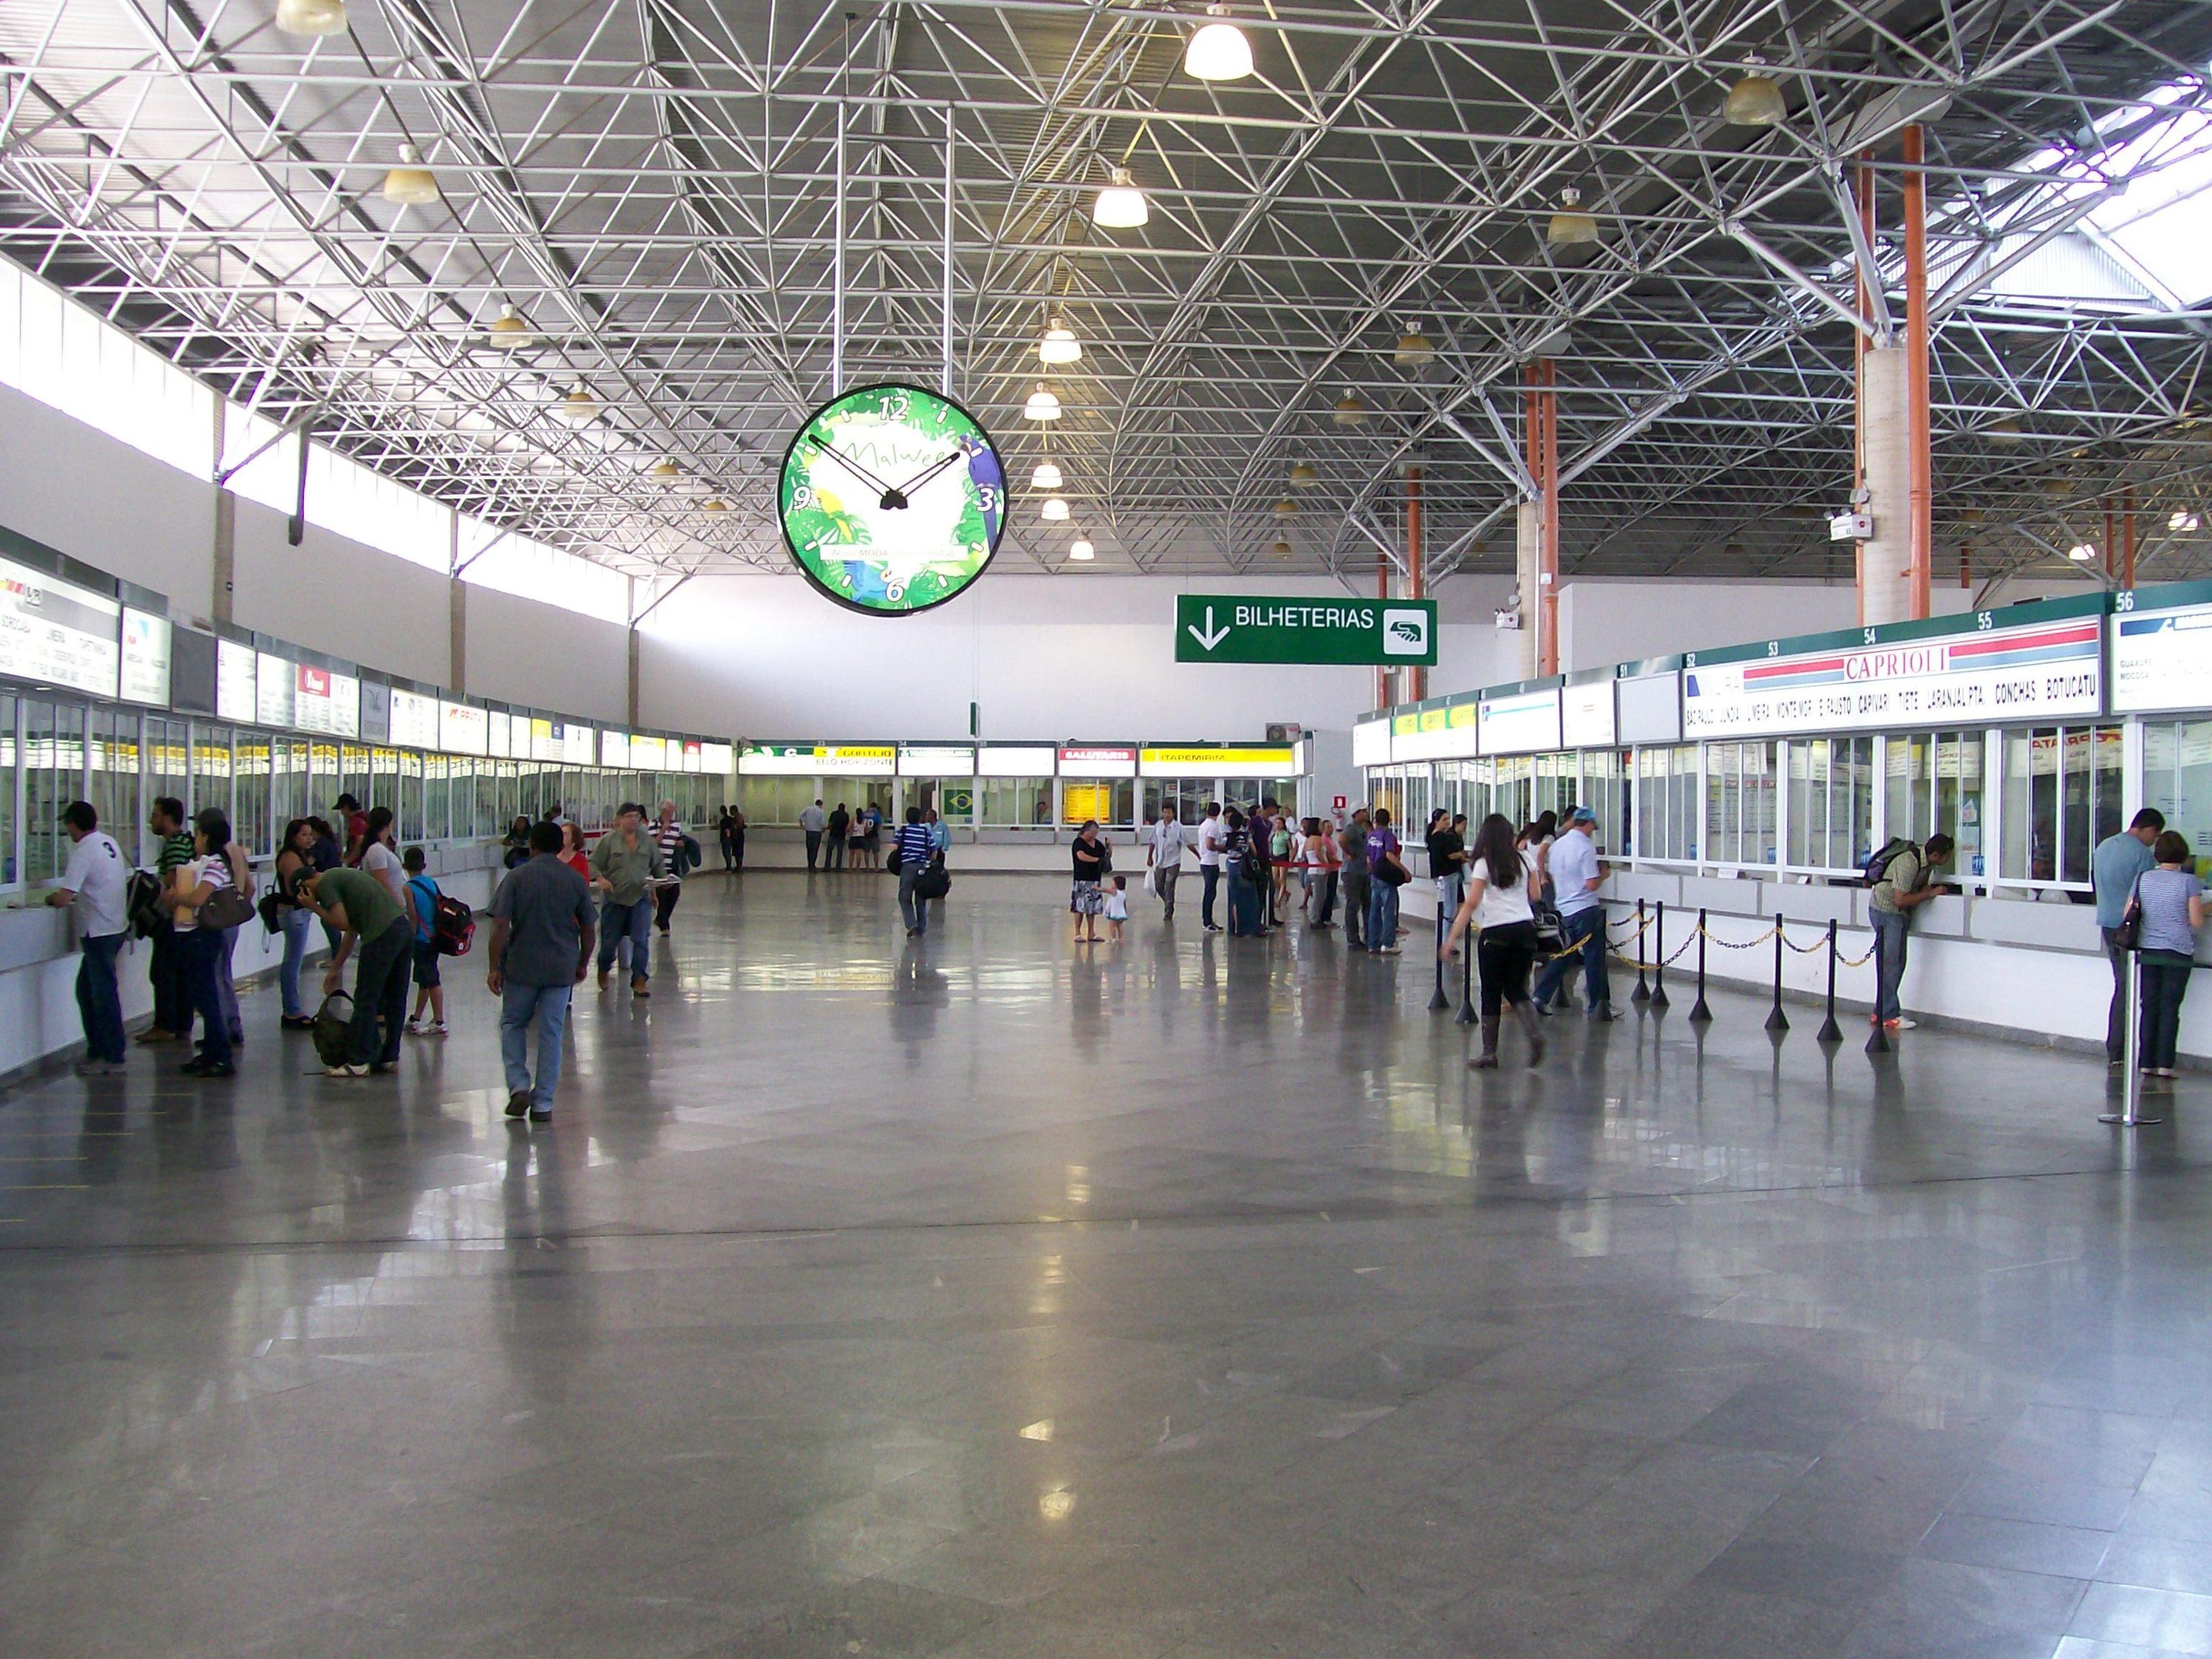 Sind Vigilância, http://www.sindvigilanciaosasco.org.br/Noticias/view.aspx?id=144